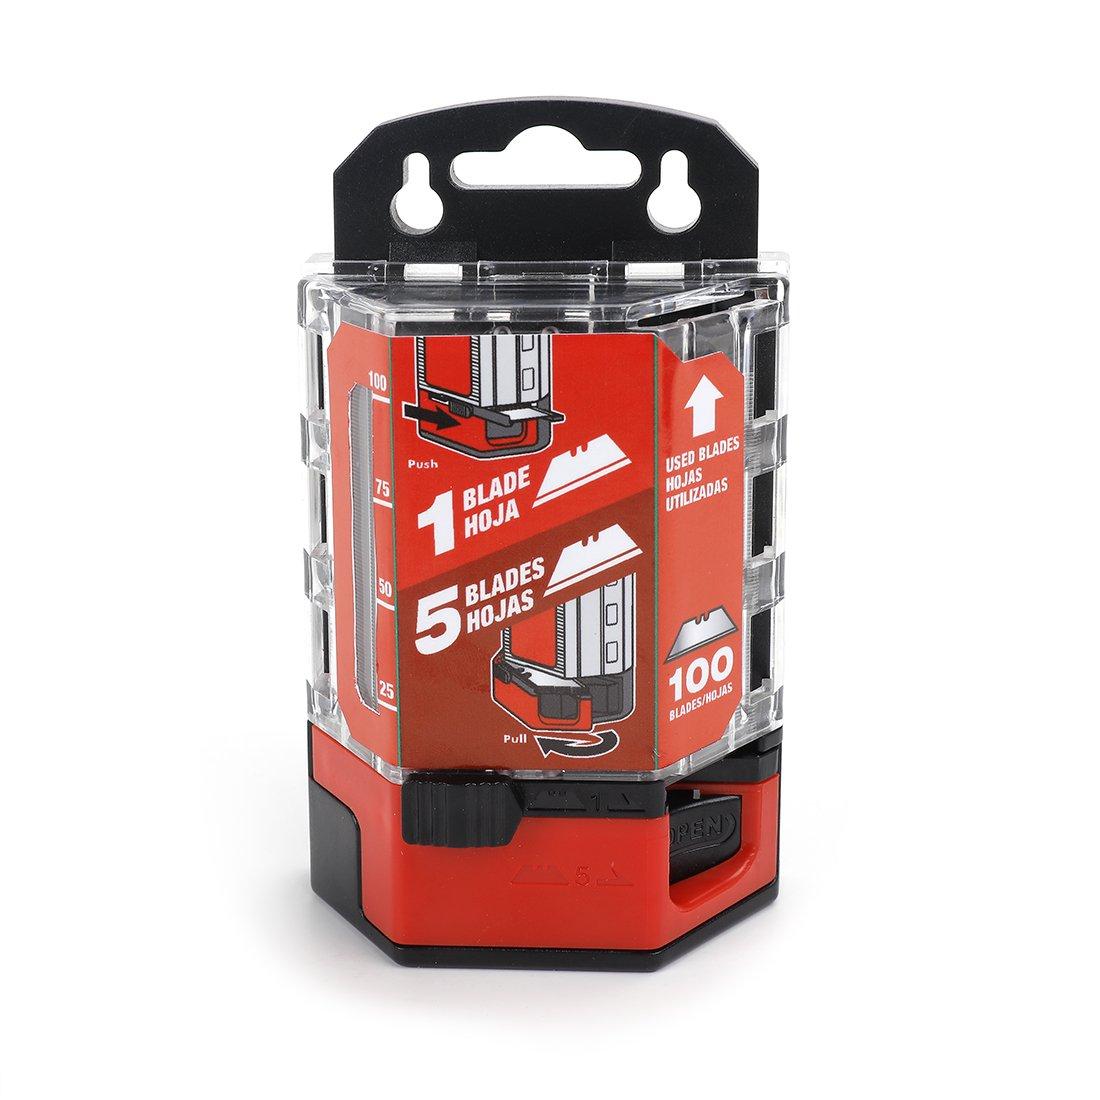 Goldblatt 100-Pack Heavy Duty Utility Blades Premium Tempered SK2M Steel with Dispenser by Goldblatt